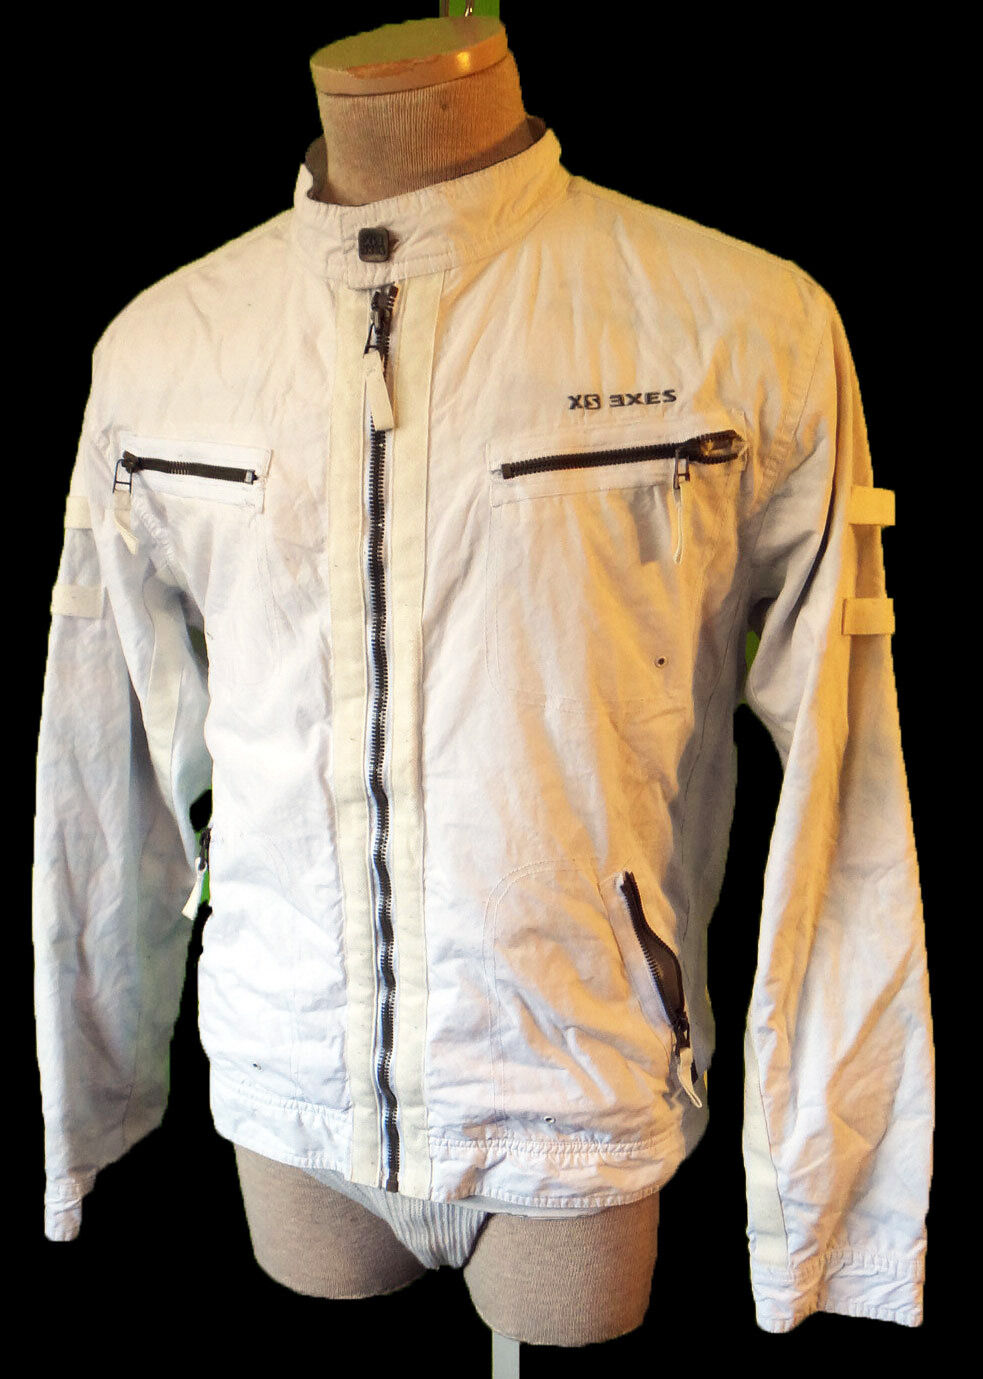 White cotton cafe racing parachute vintage zipper coat motorcycle coat medium xs